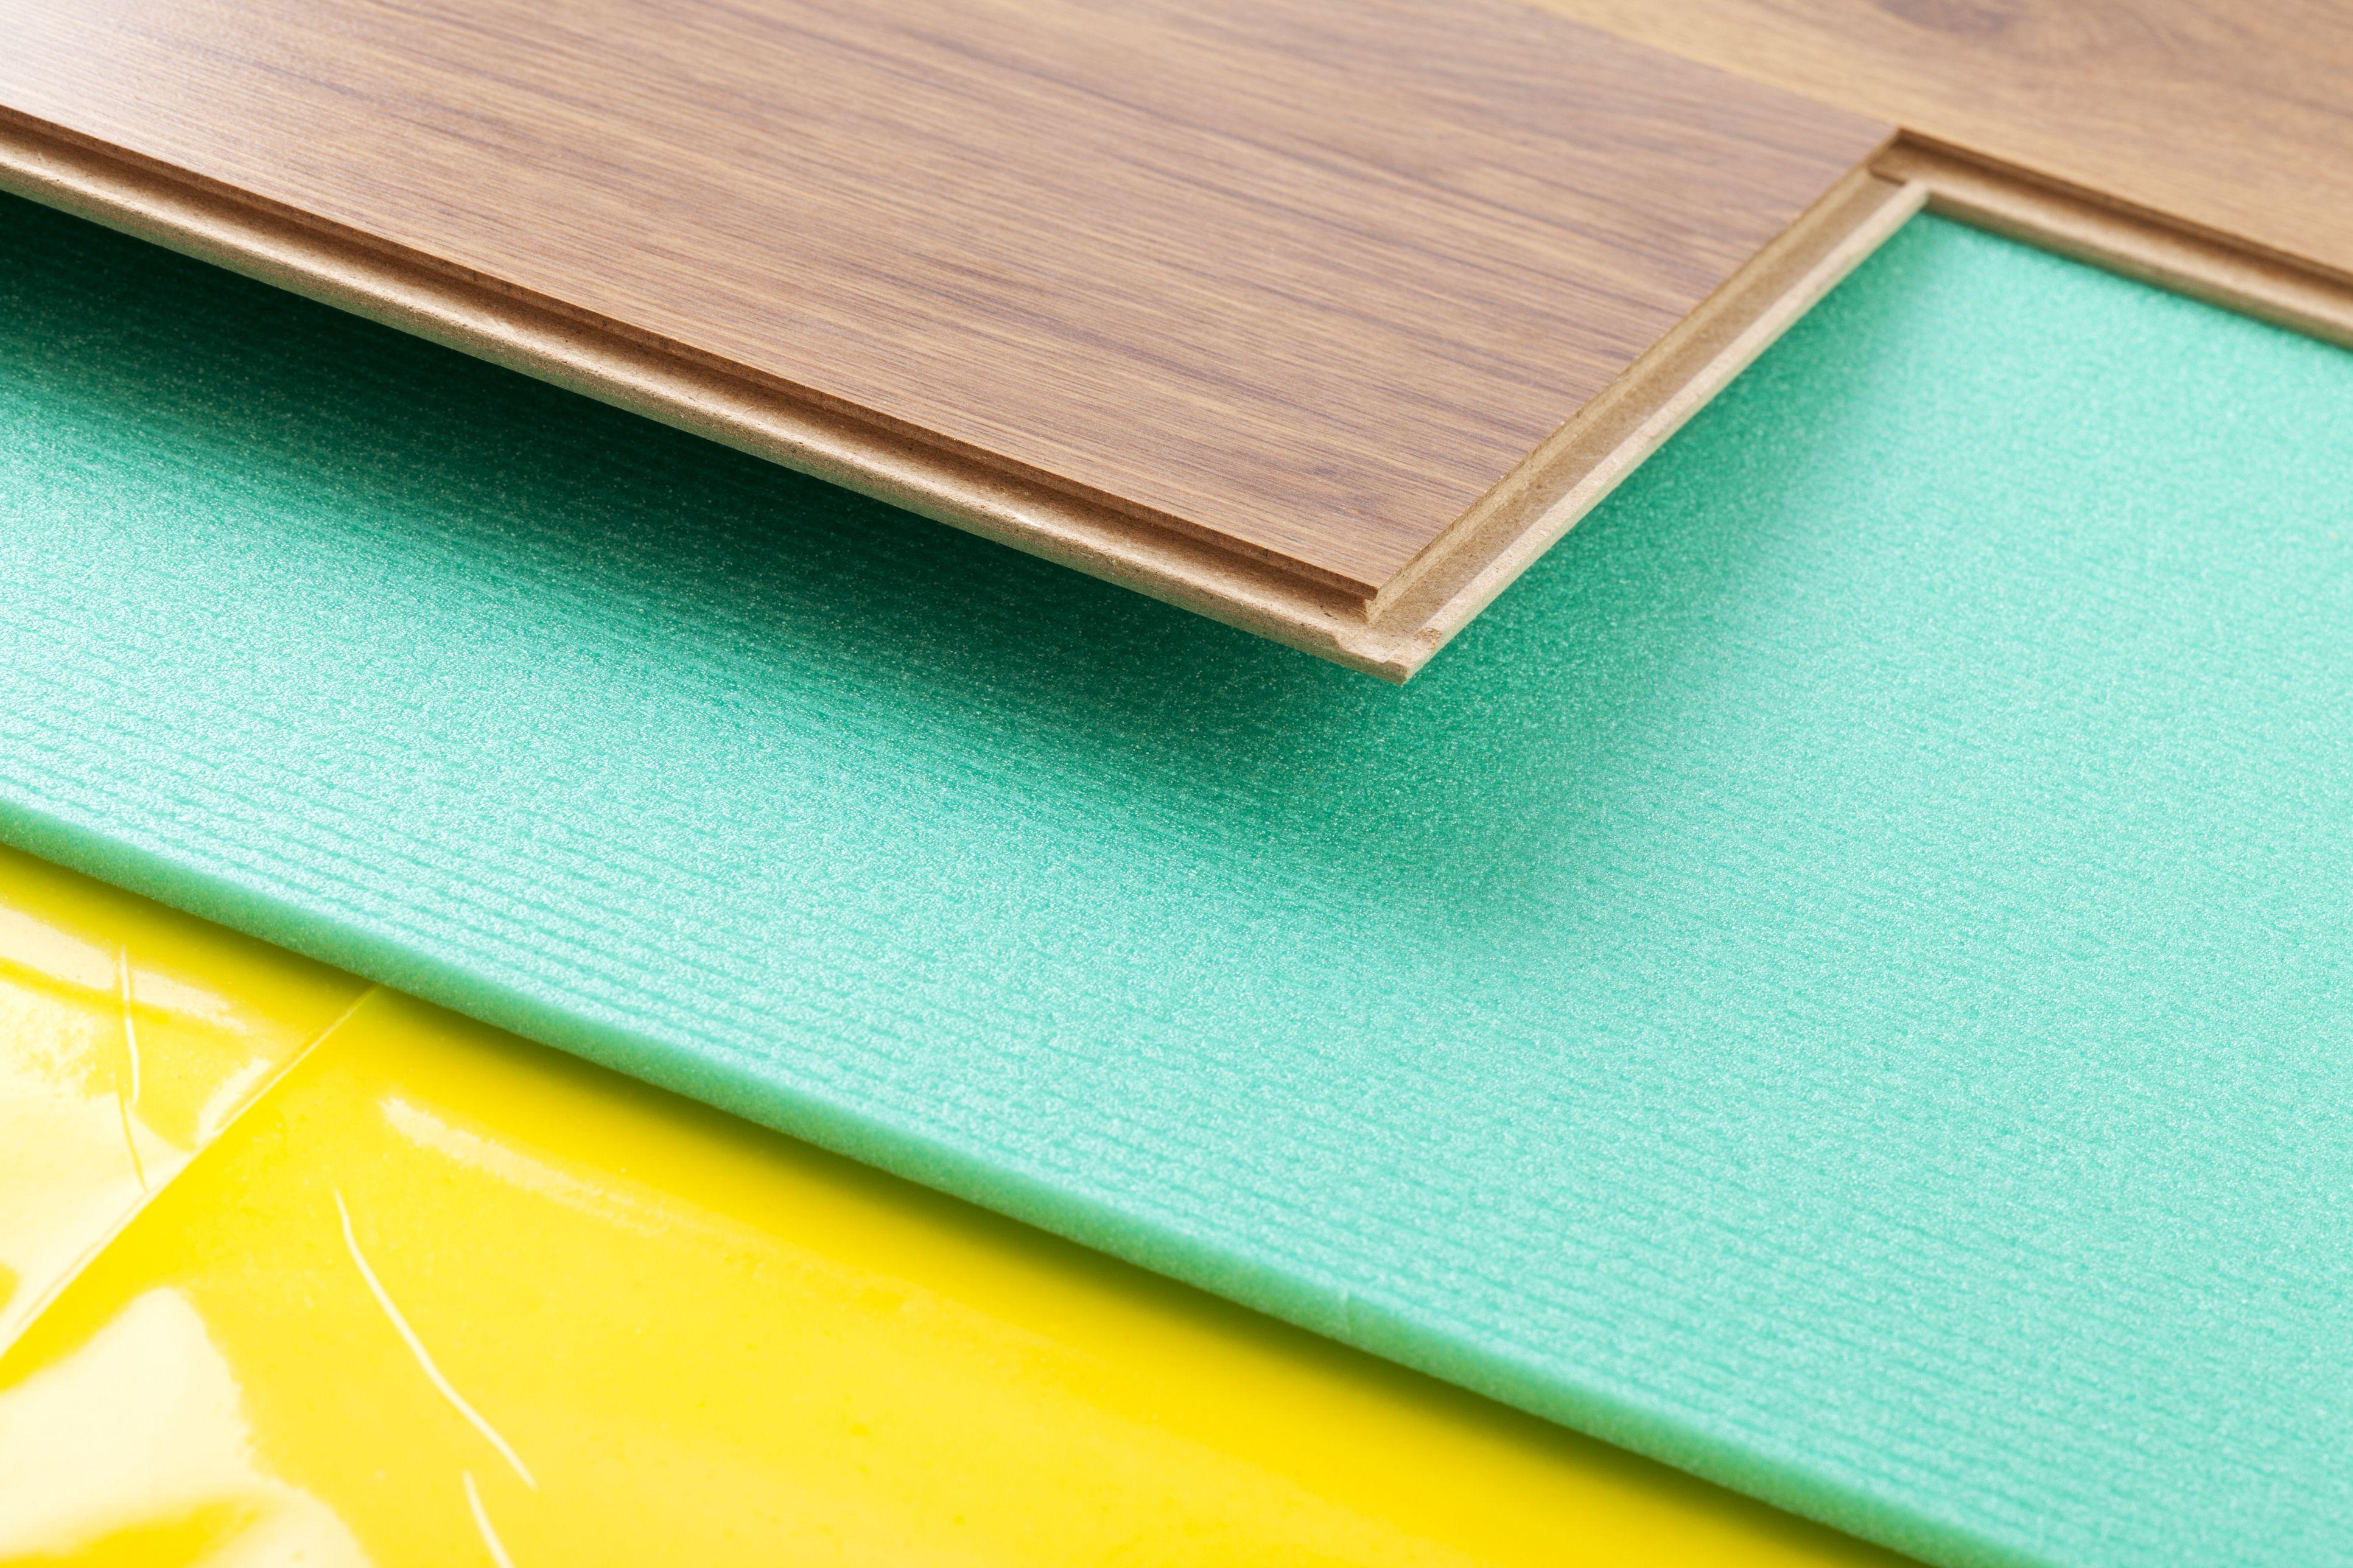 Laminate Flooring Underlayment Types To Buy And Basics